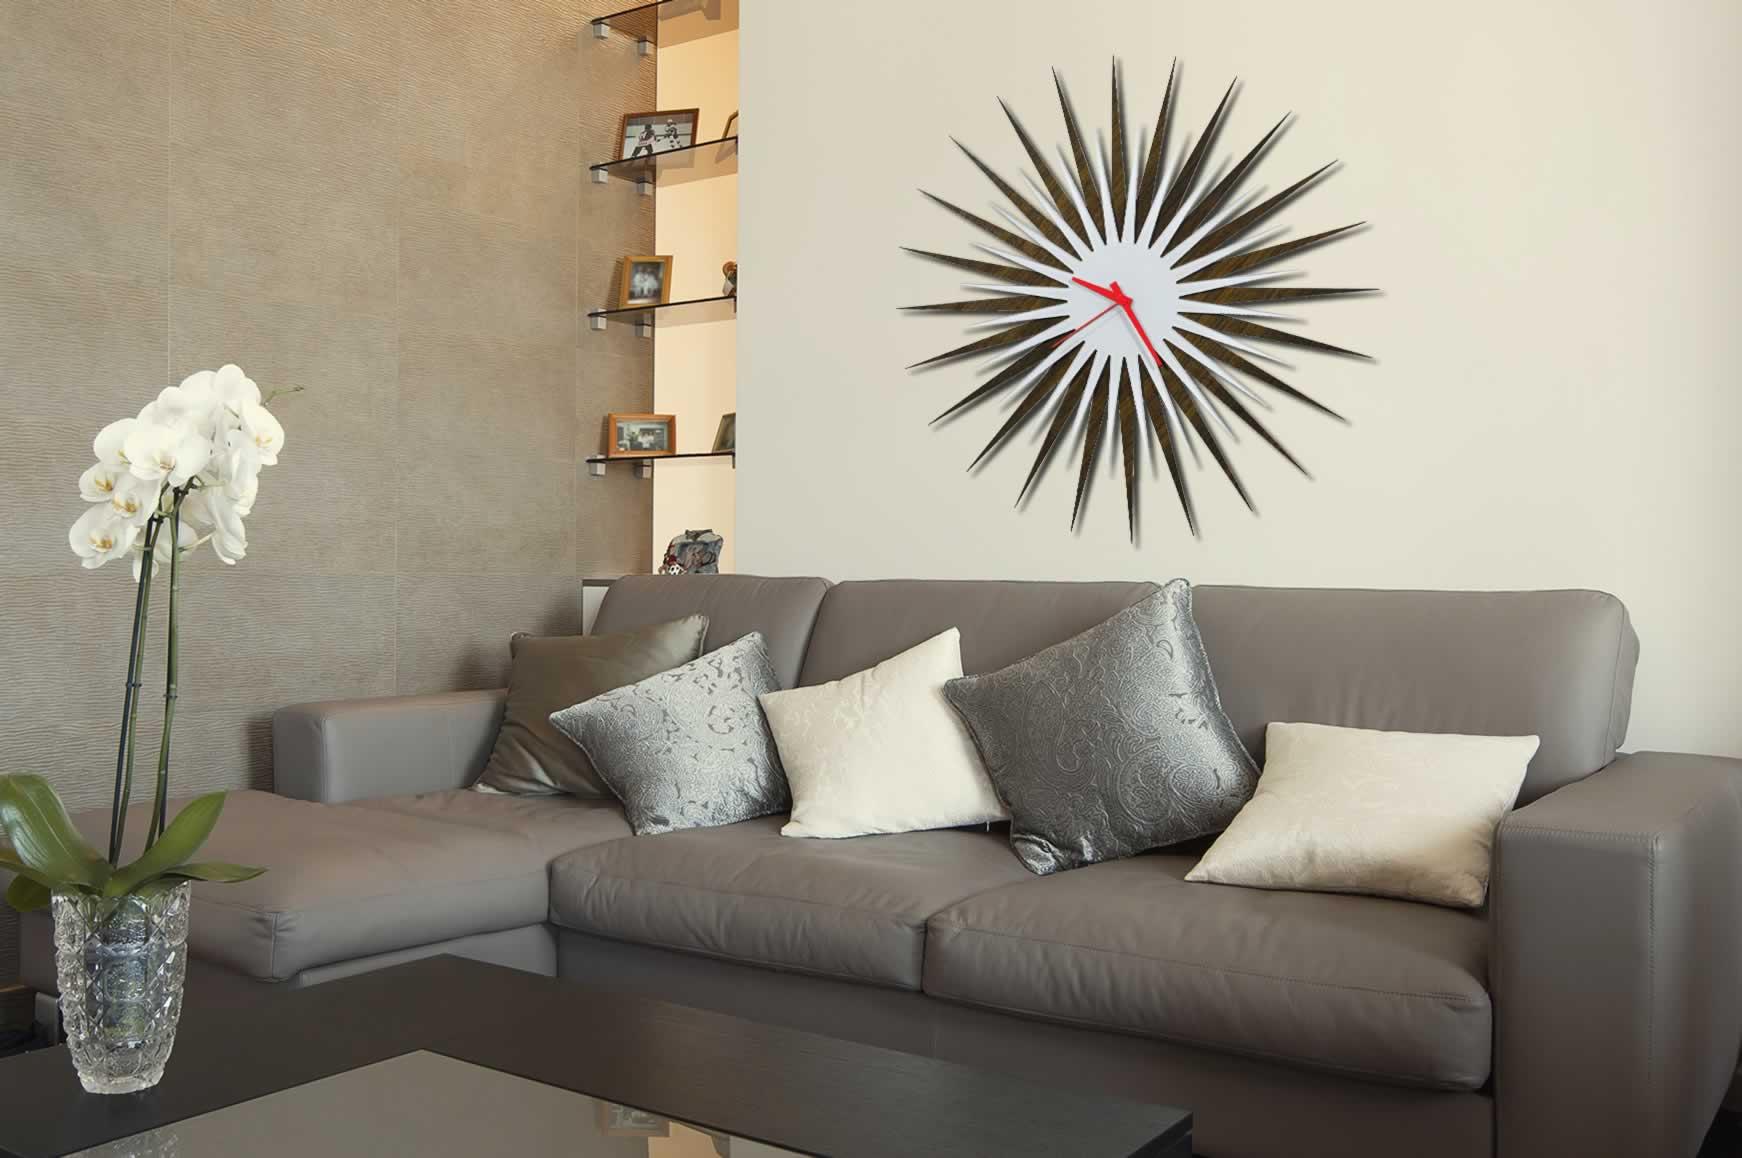 RF Atomic Clock - Walnut White/Red Starburst - Lifestyle Image